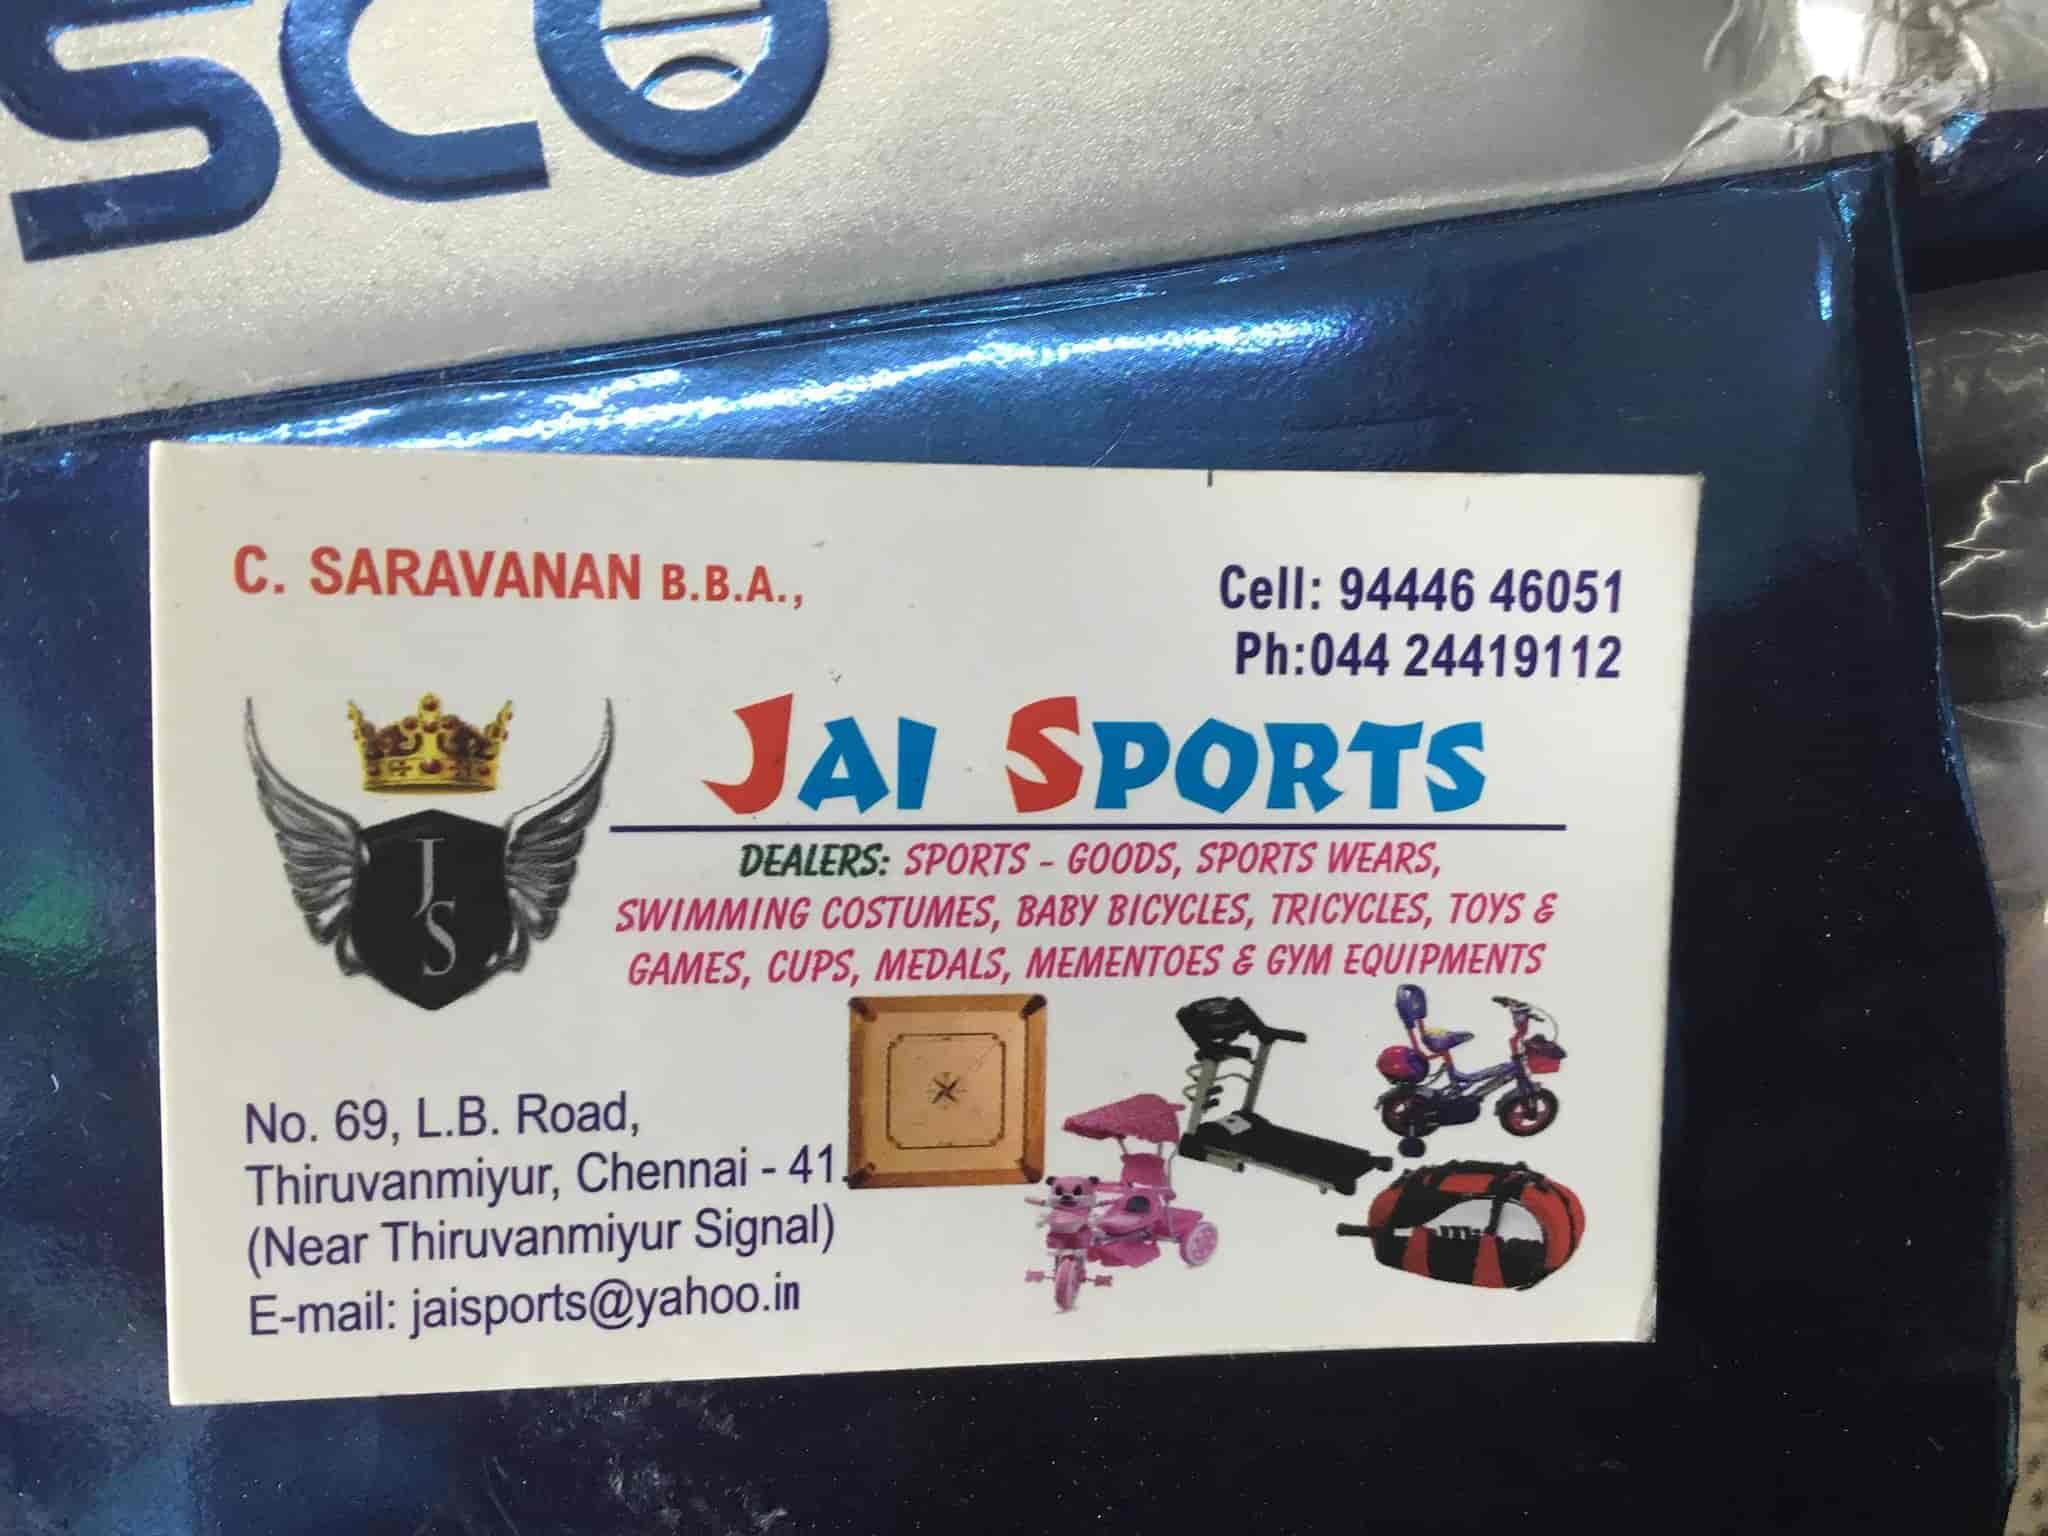 Jai sports thiruvanmiyur jay sports sports goods dealers in jai sports thiruvanmiyur jay sports sports goods dealers in chennai justdial solutioingenieria Choice Image